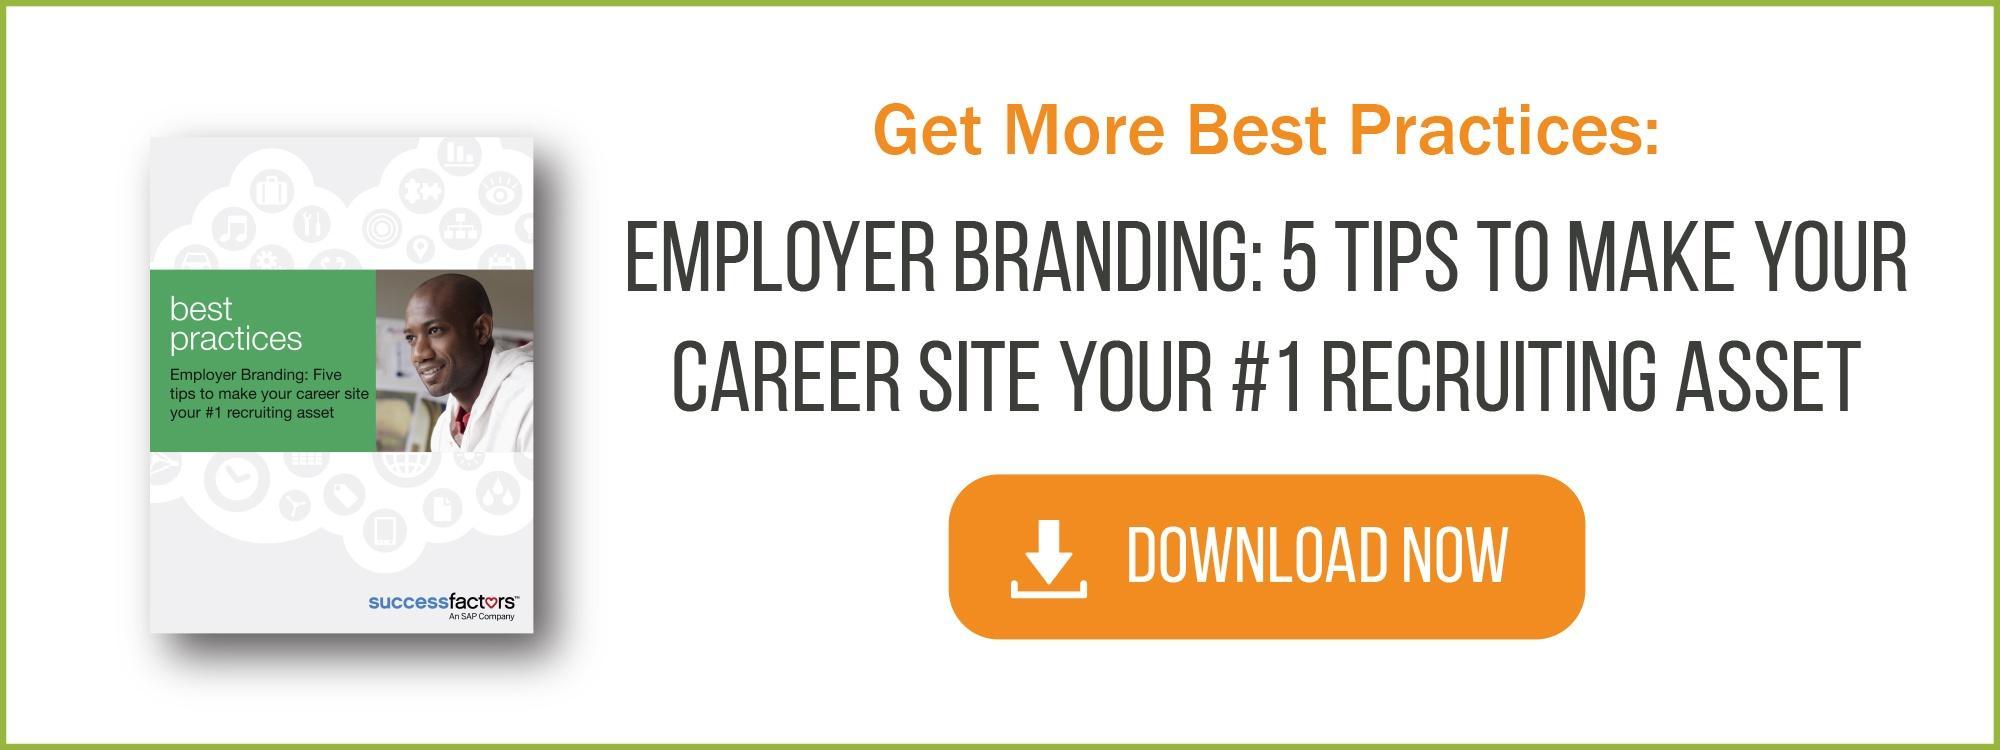 understanding sap successfactors career site builder like what you